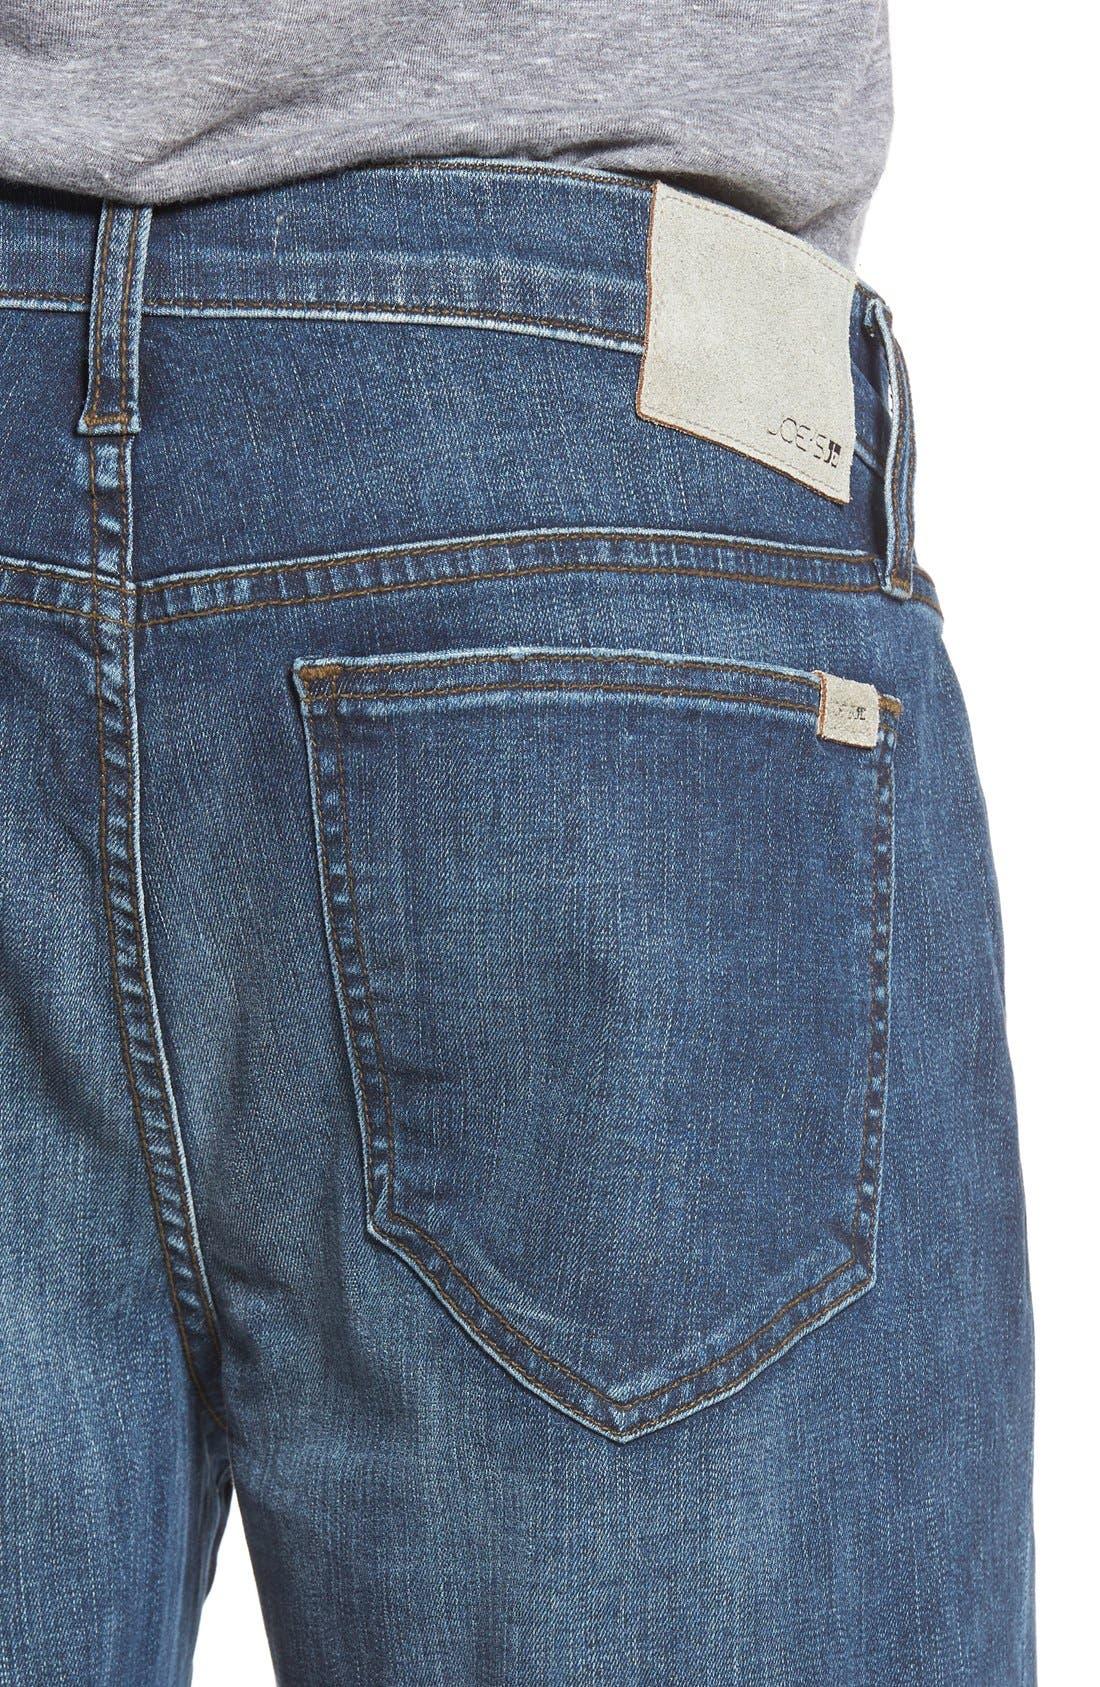 Brixton Slim Fit Jeans,                             Alternate thumbnail 4, color,                             Gladwin